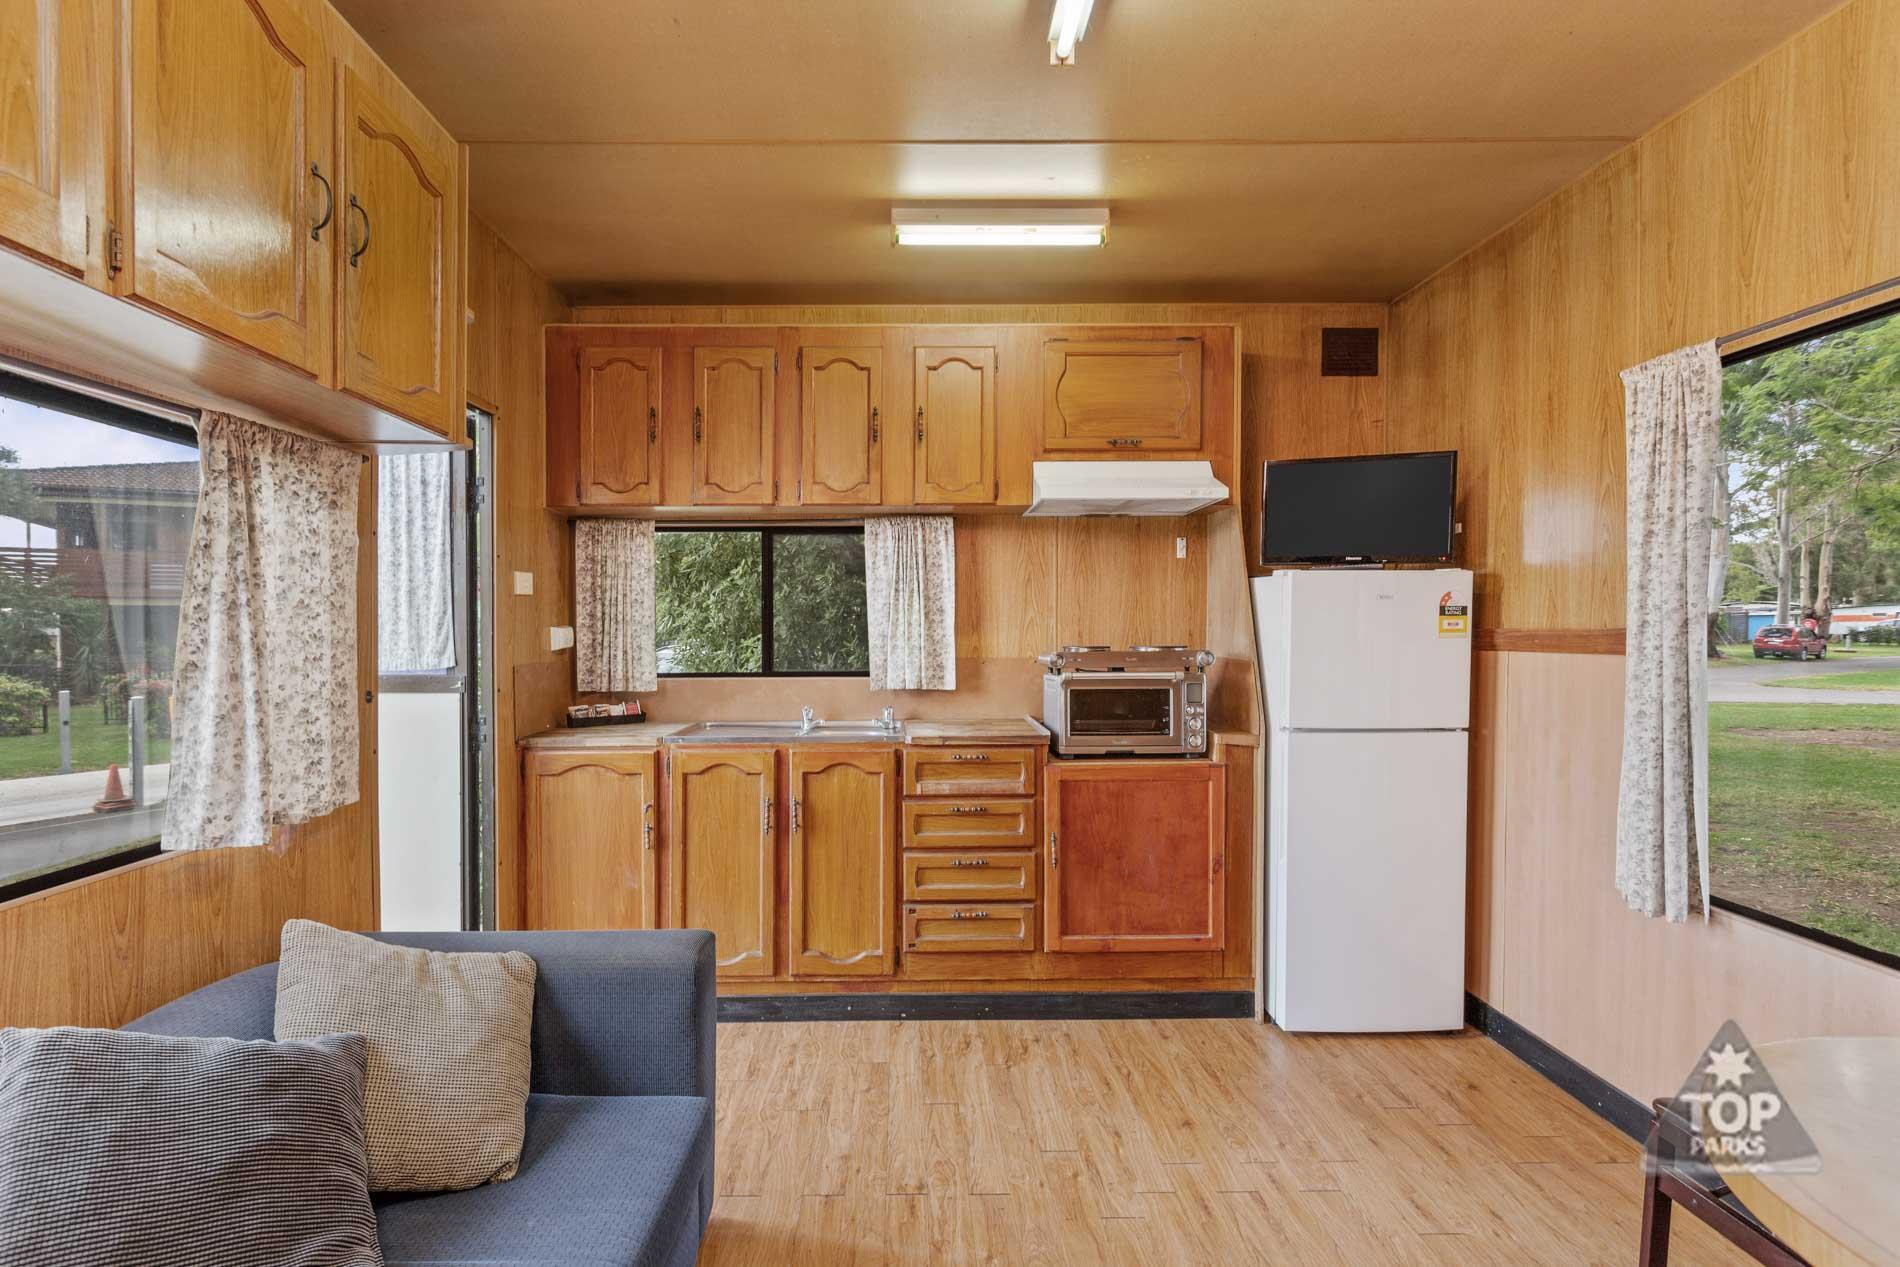 shoalhaven-caravan-village-basic cabin-kitchen-lounge